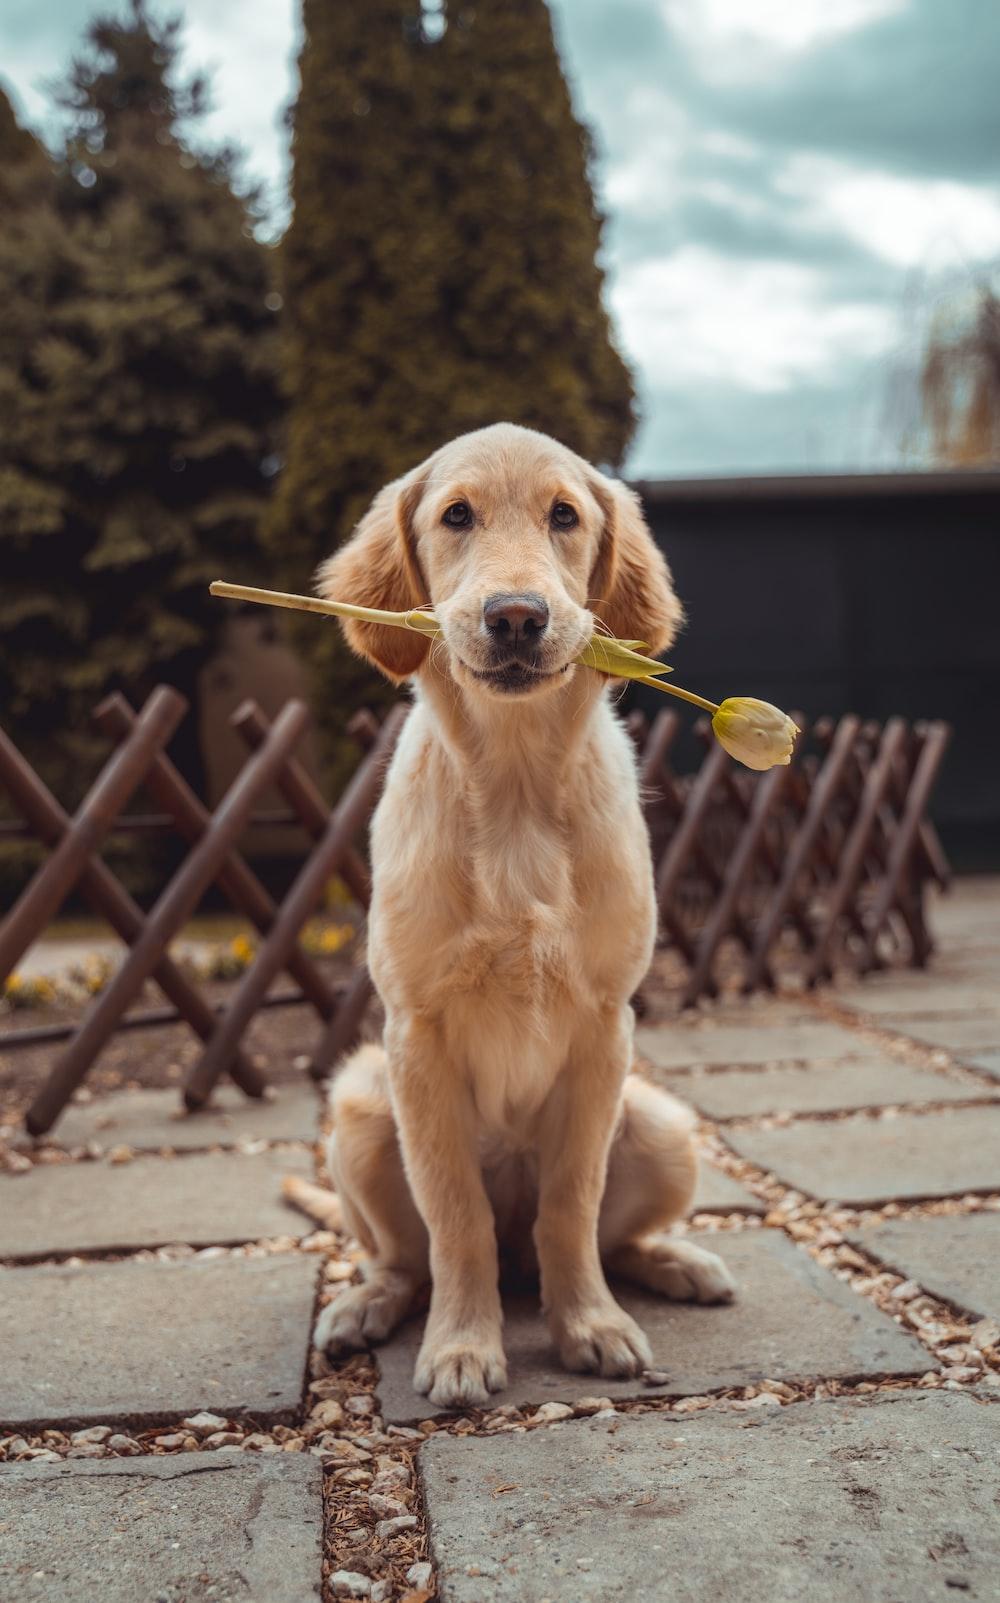 Dog Wallpapers Free Hd Download 500 Hq Unsplash